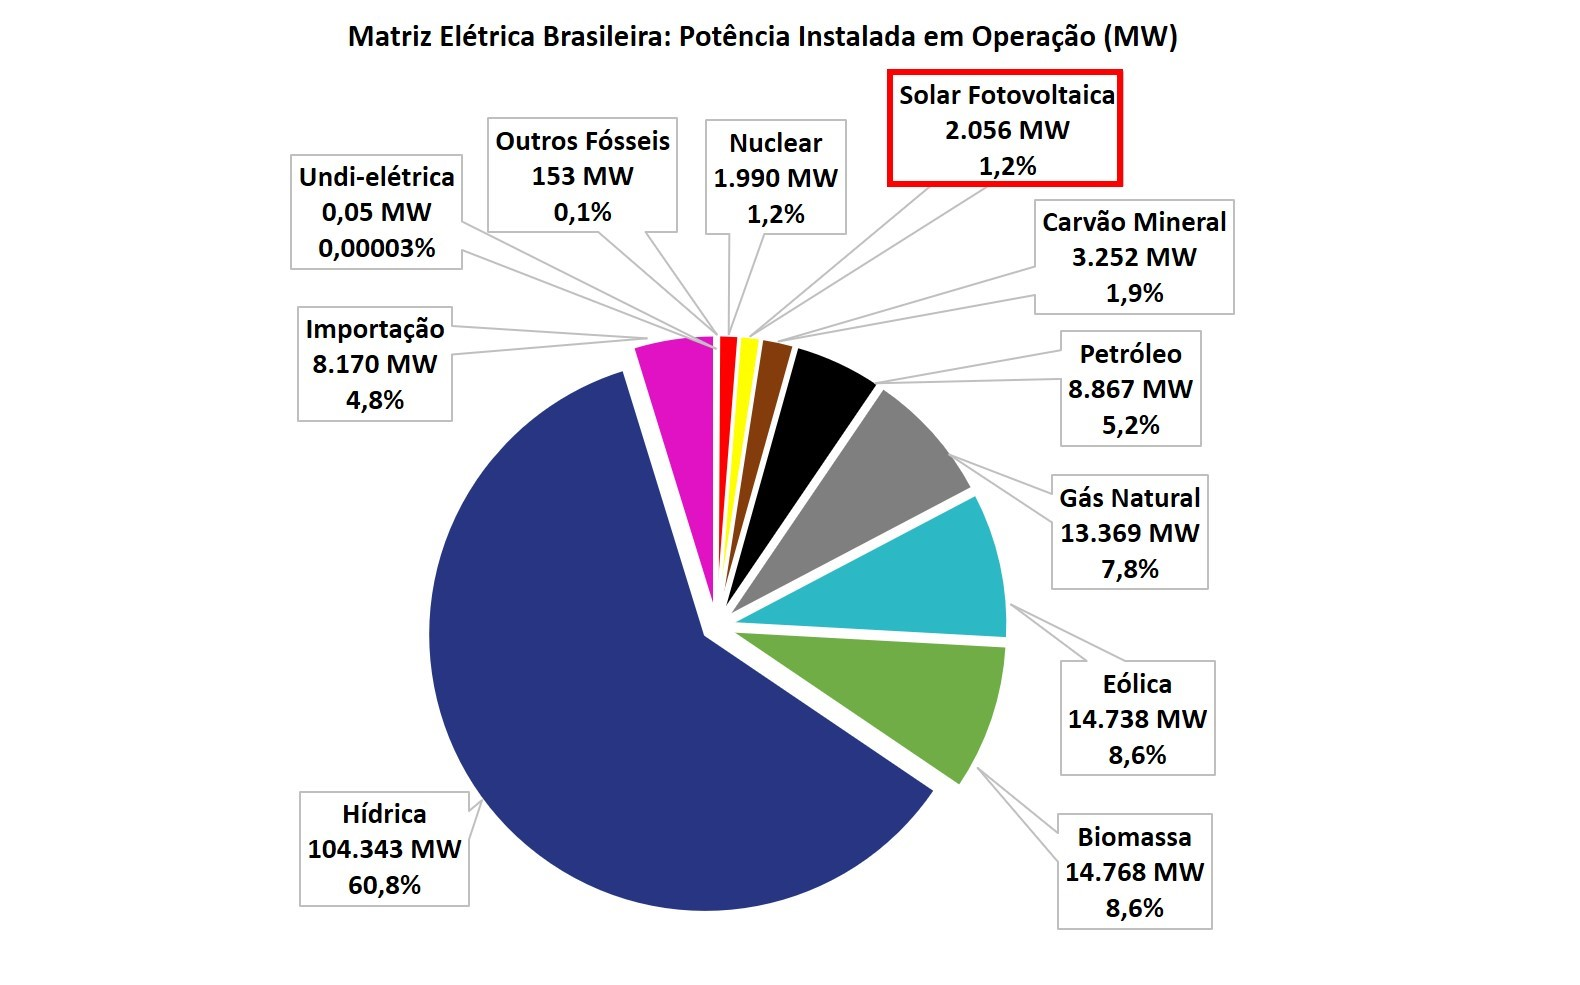 energia solar impactos ambientais _ matriz elétrica do brasil